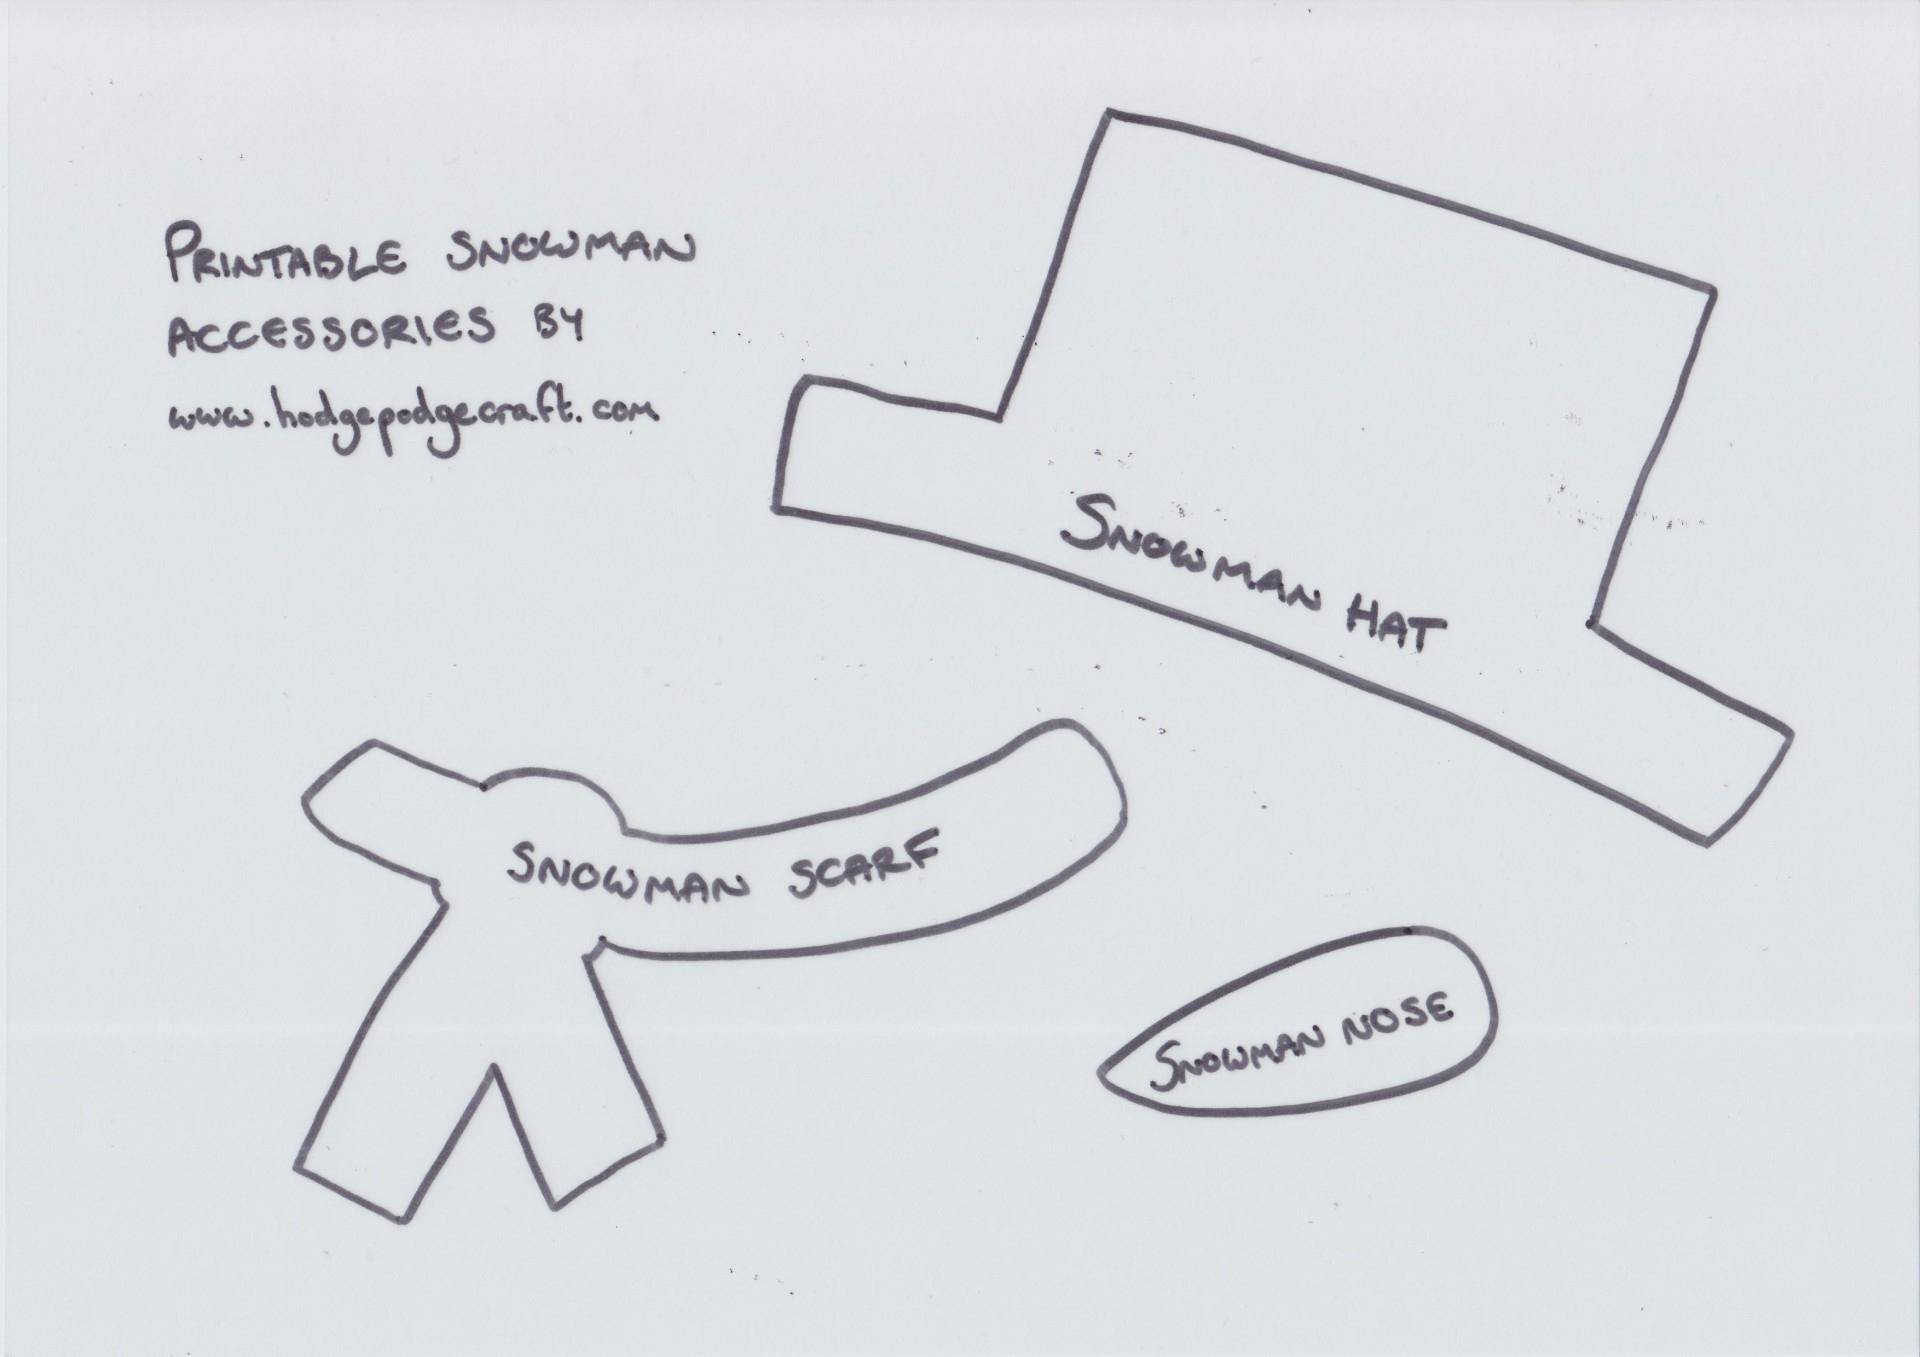 Snowman Hat Printable Mini Snowman Hat Template Printable Snowman - Free Printable Snowman Hat Templates